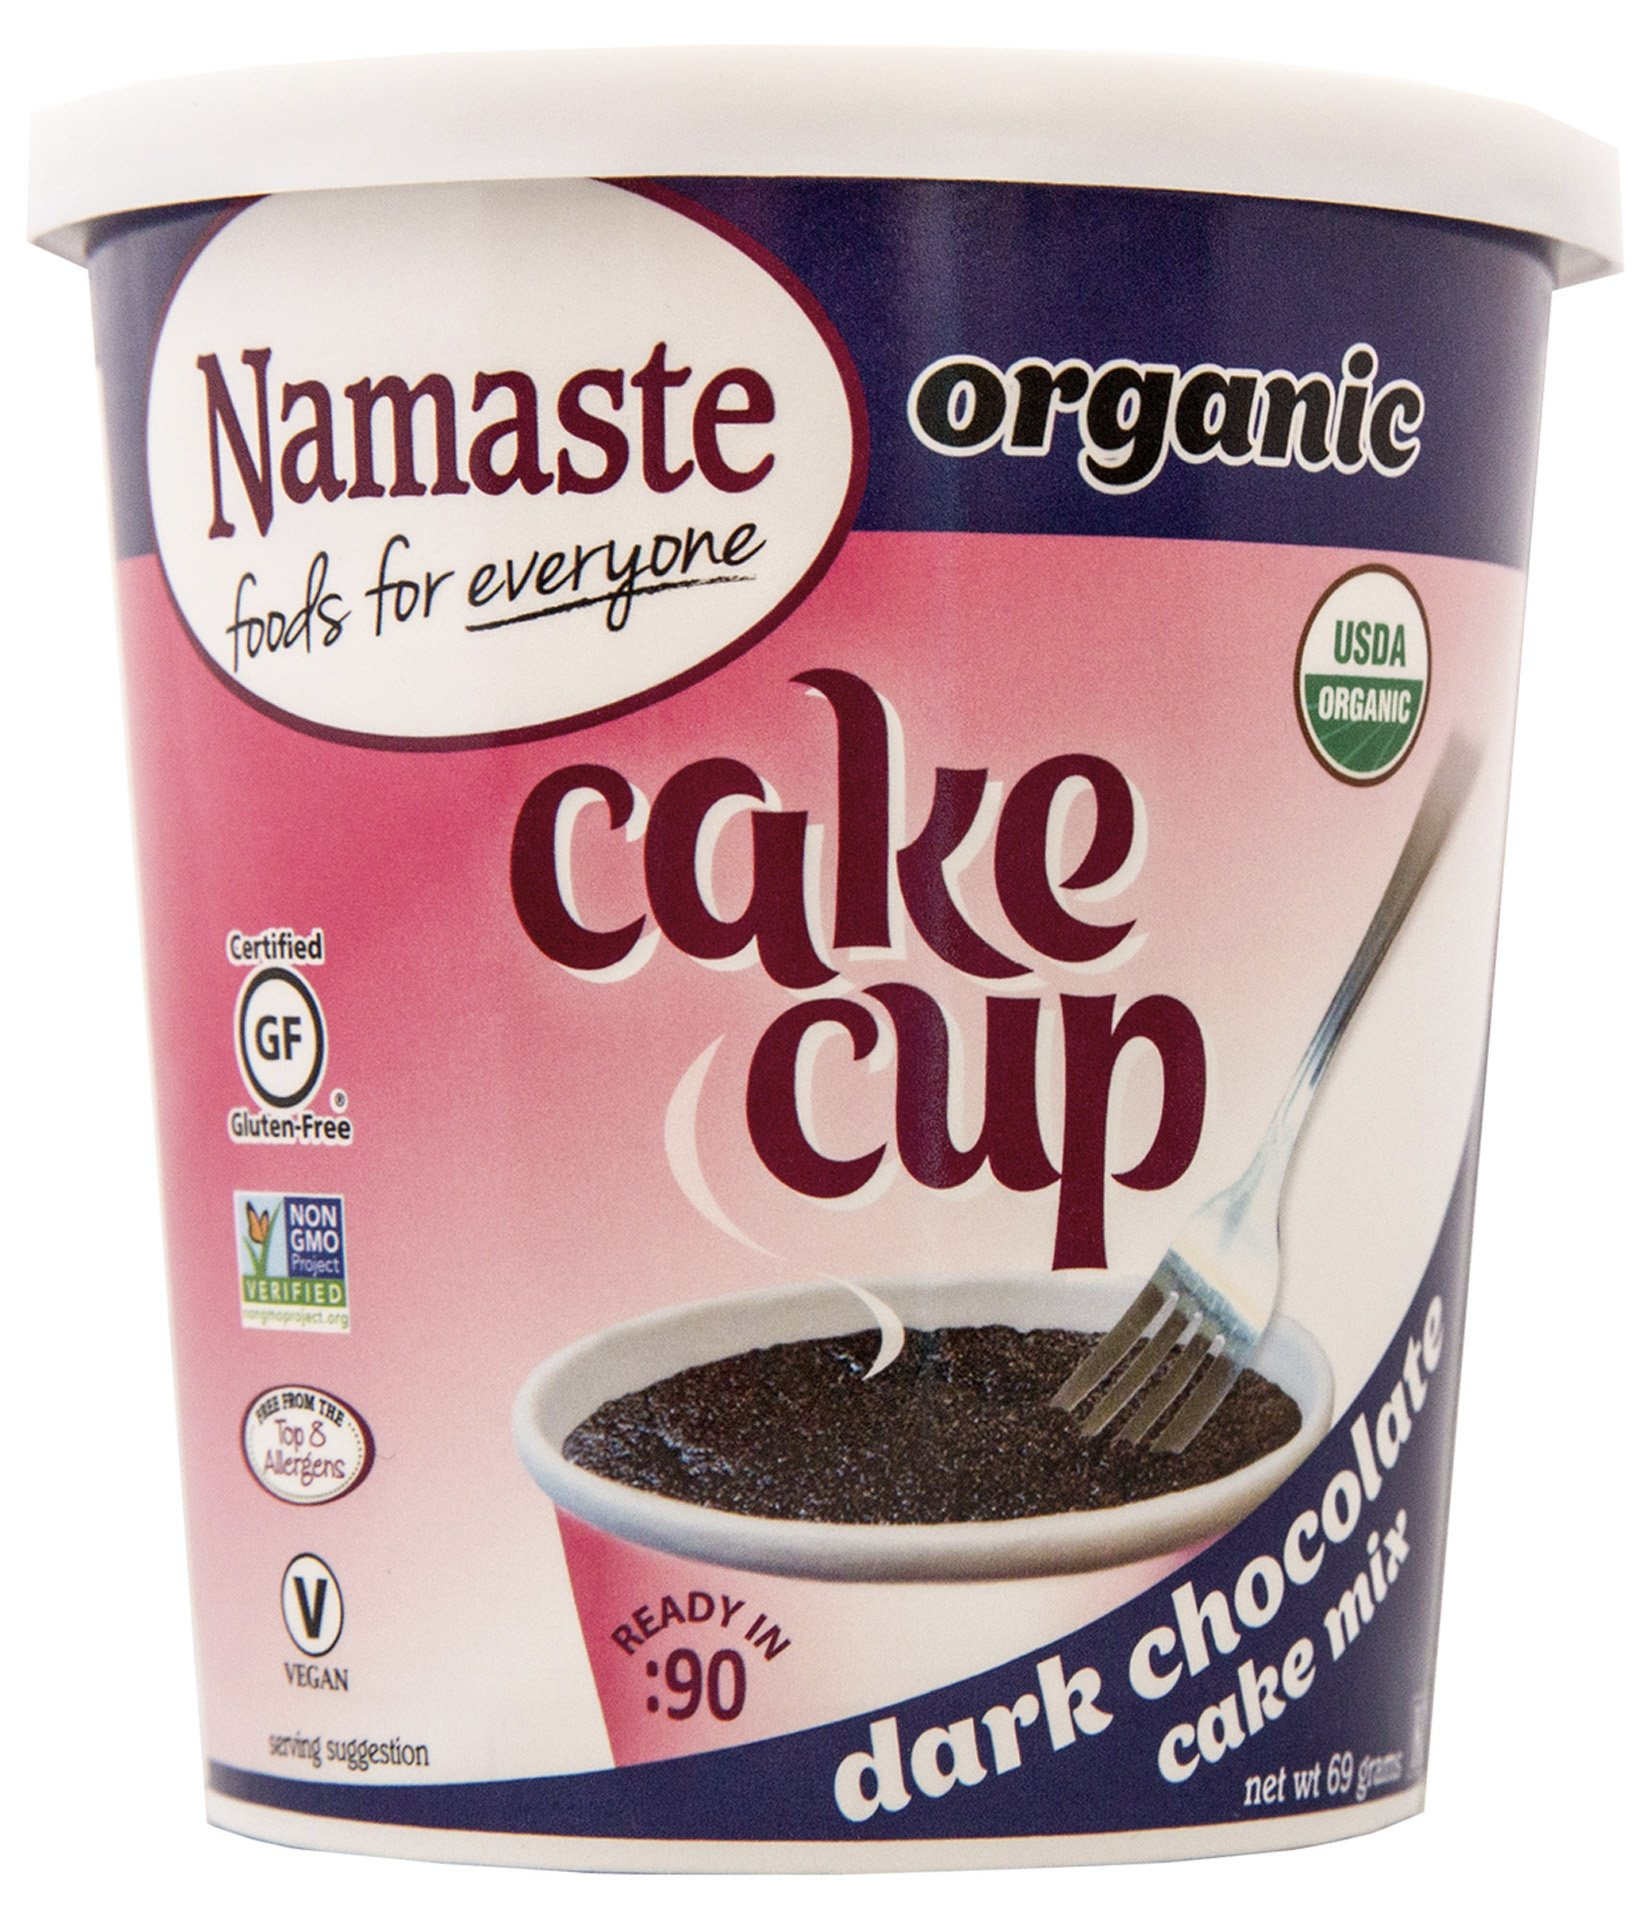 Namaste Foods Gluten Free Organic Cake Cup, Dark Chocolate, 2.43 Oz (Pack Of 12) by Namaste Foods